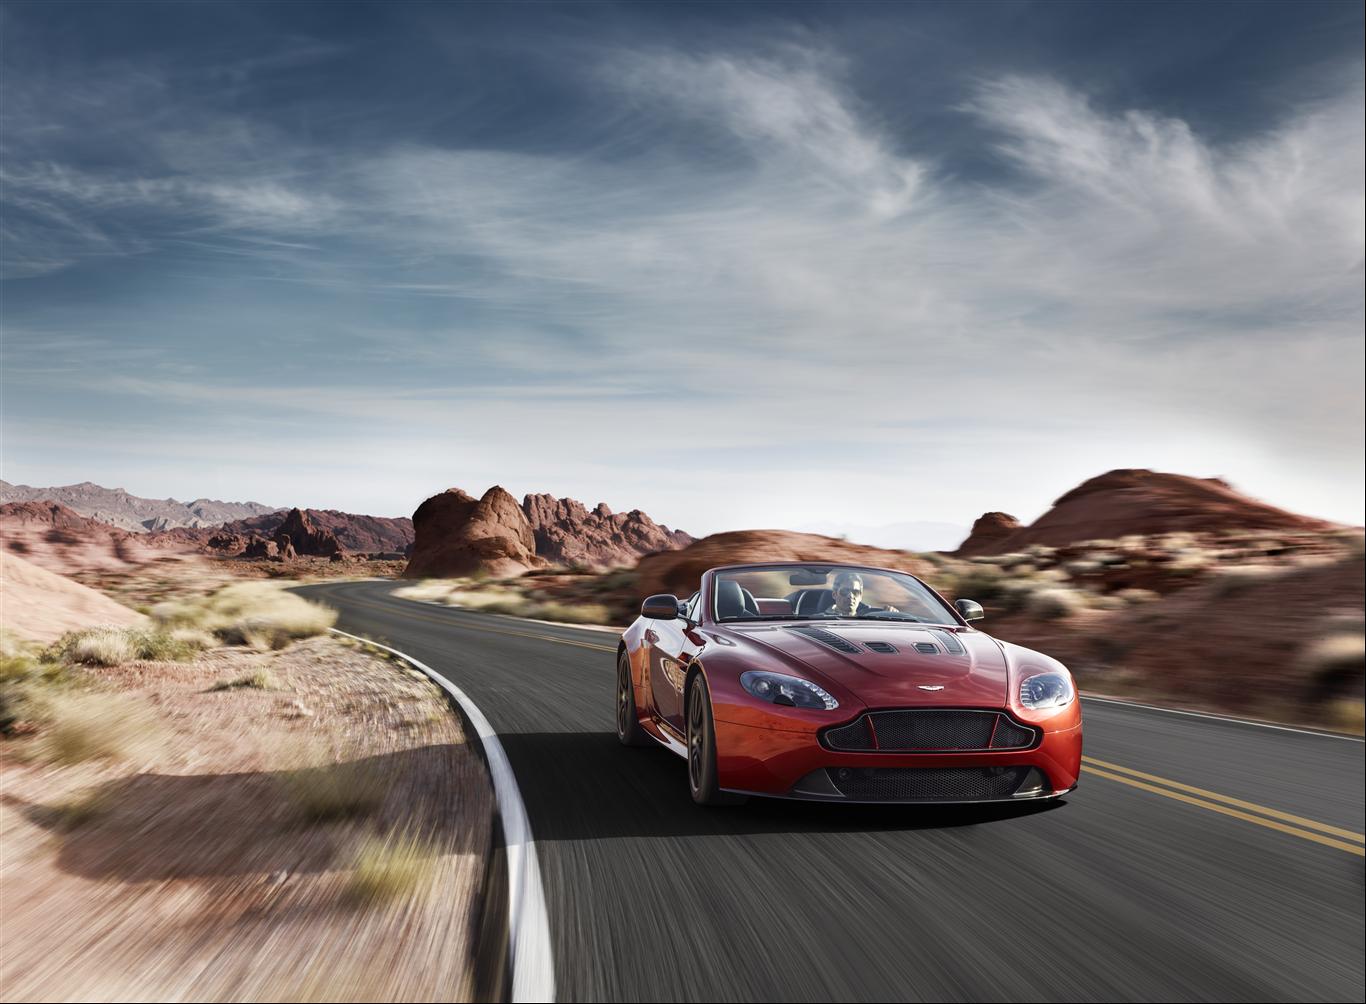 O Aston Martin V12 Vantage S Roadster E Um Hino Aos Descapotaveis